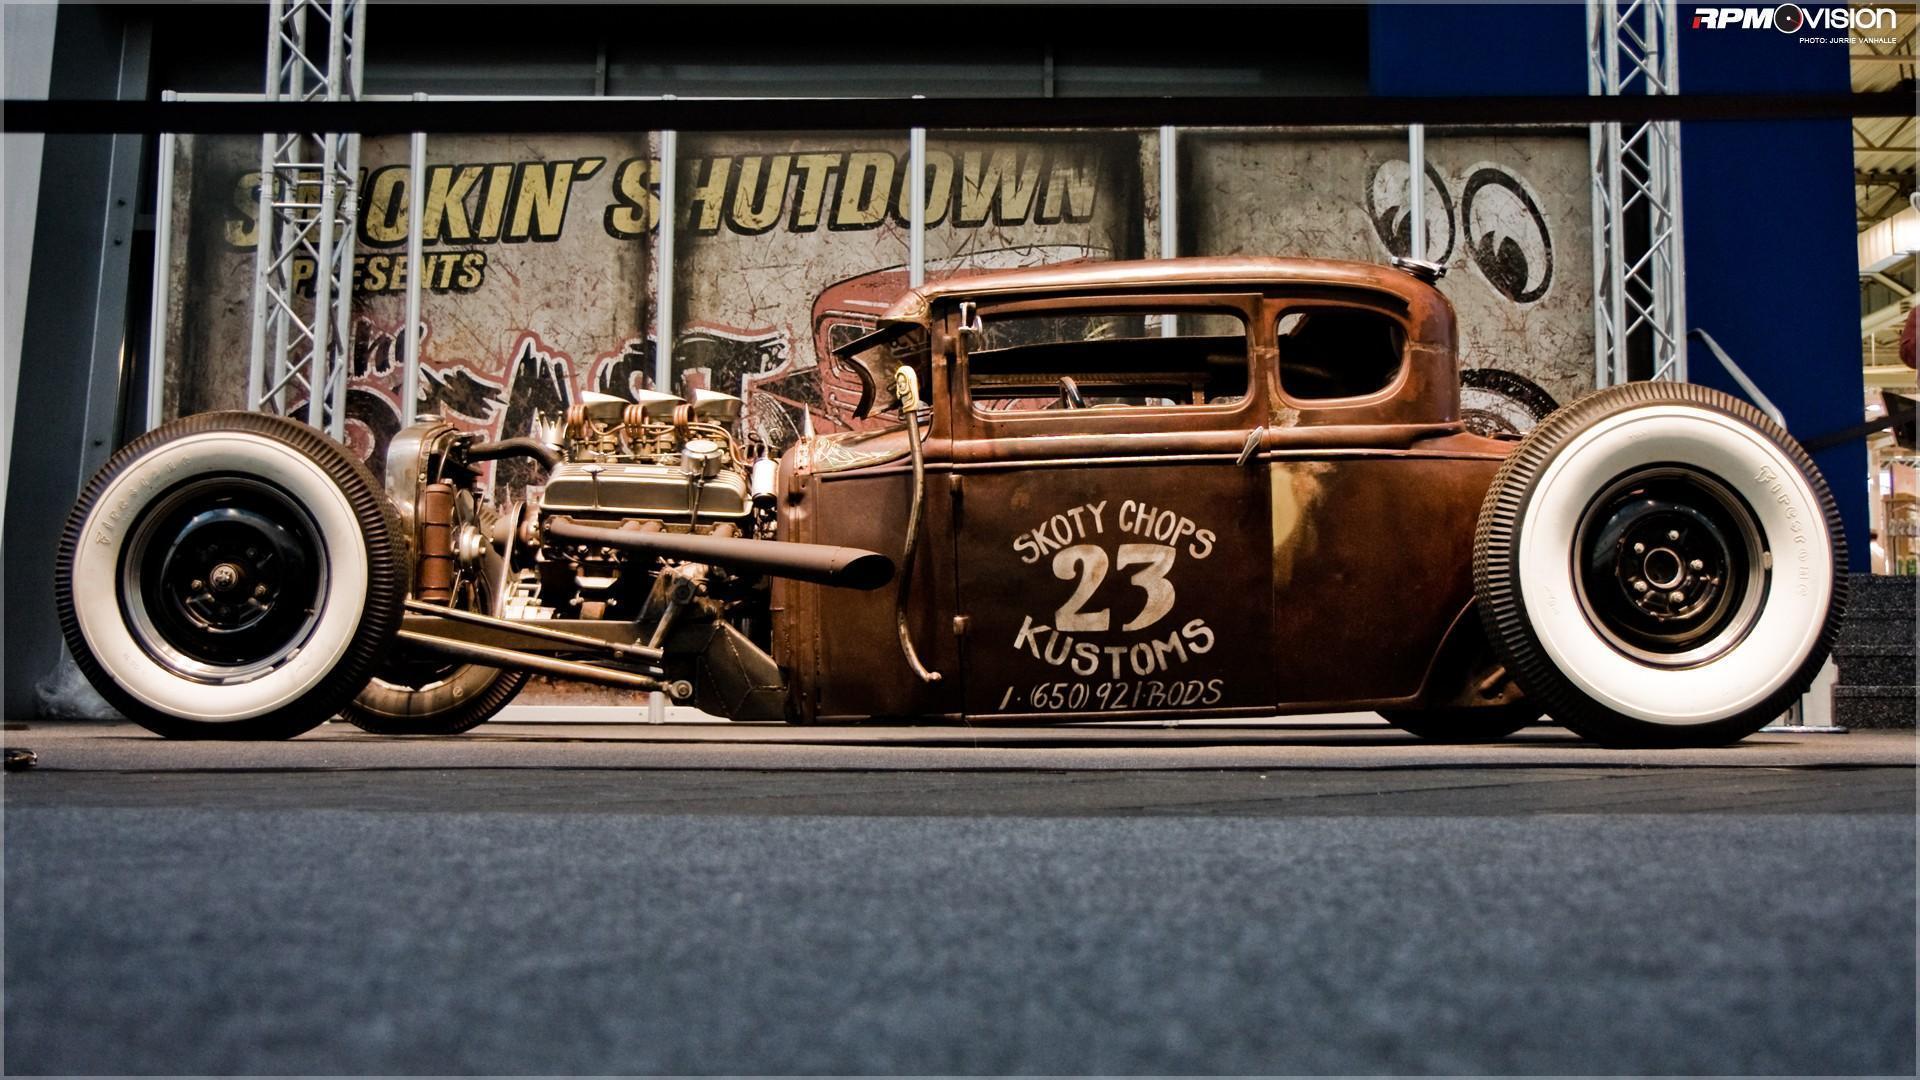 vintage hot rod wallpaper - photo #6